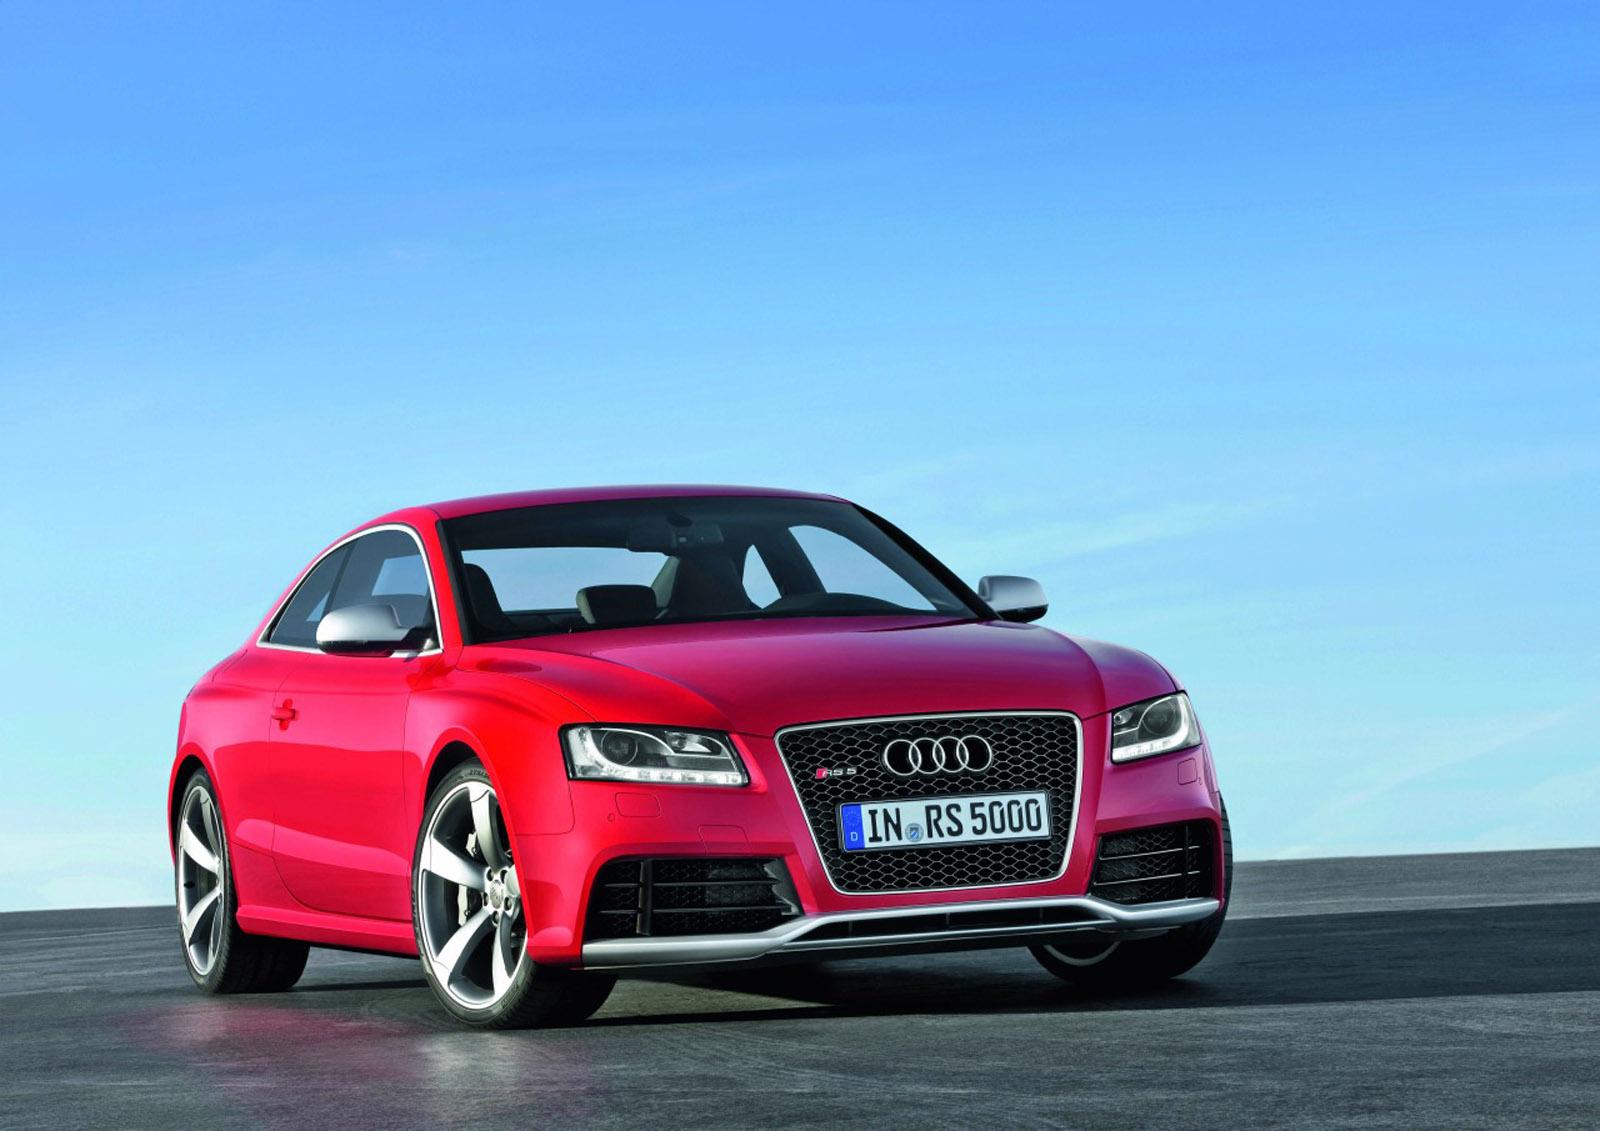 Audi Rs5 Coupe Vs Tuned Audi S5 Sportback